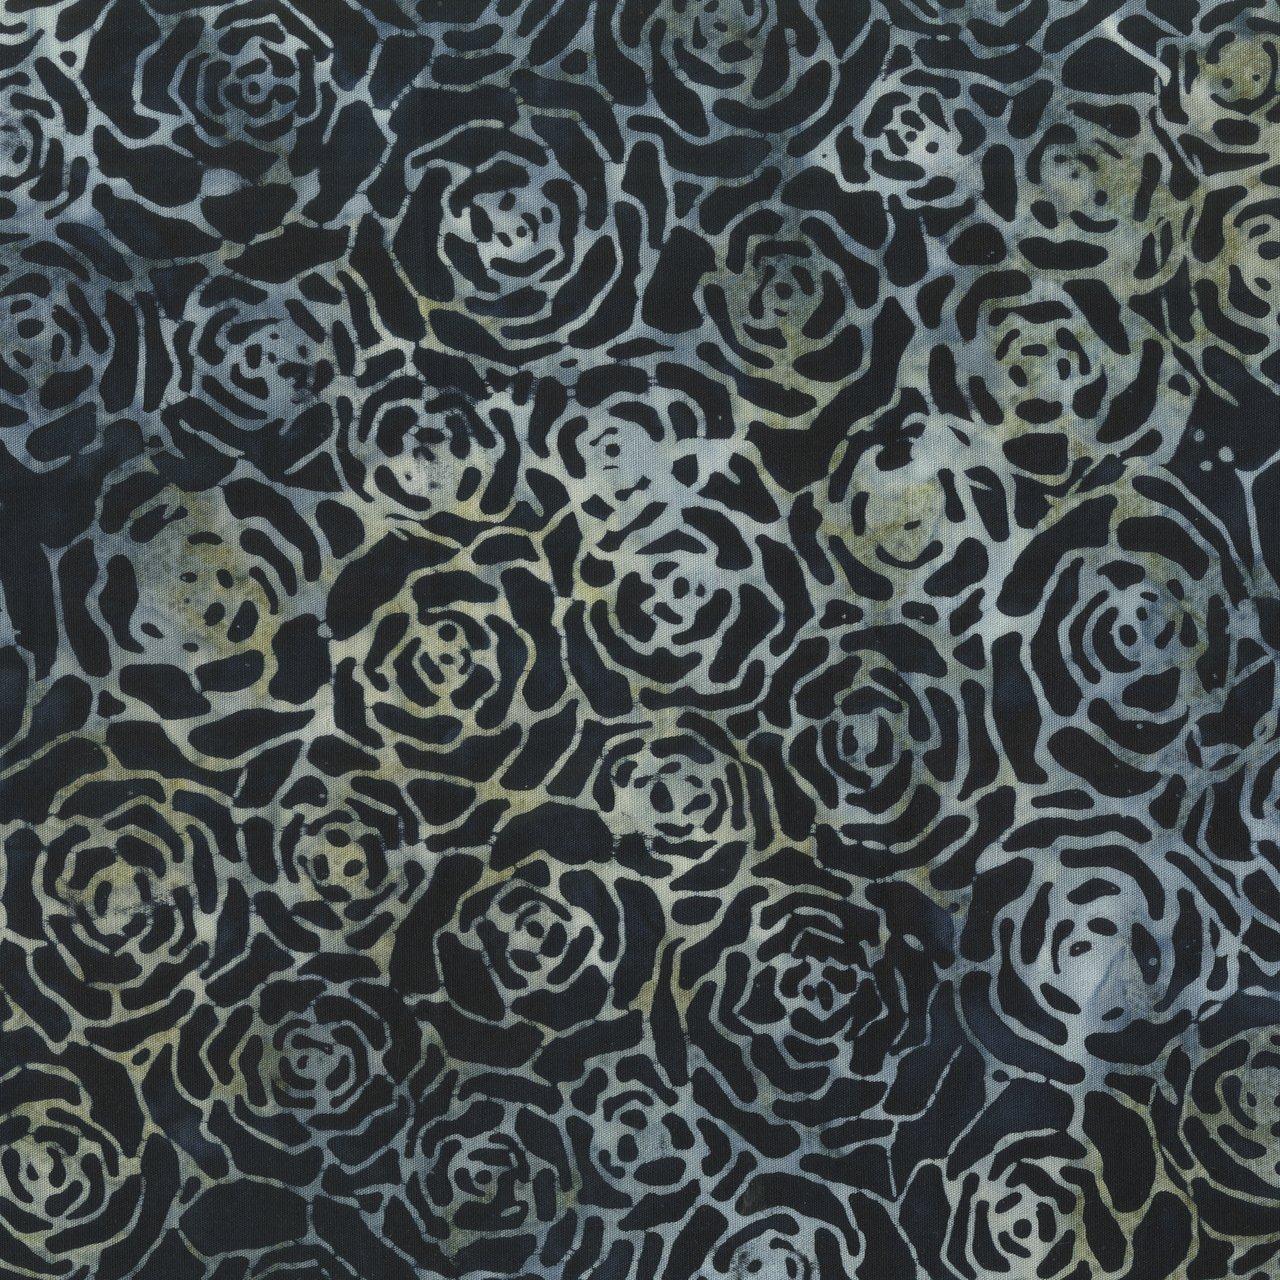 Roses,Black